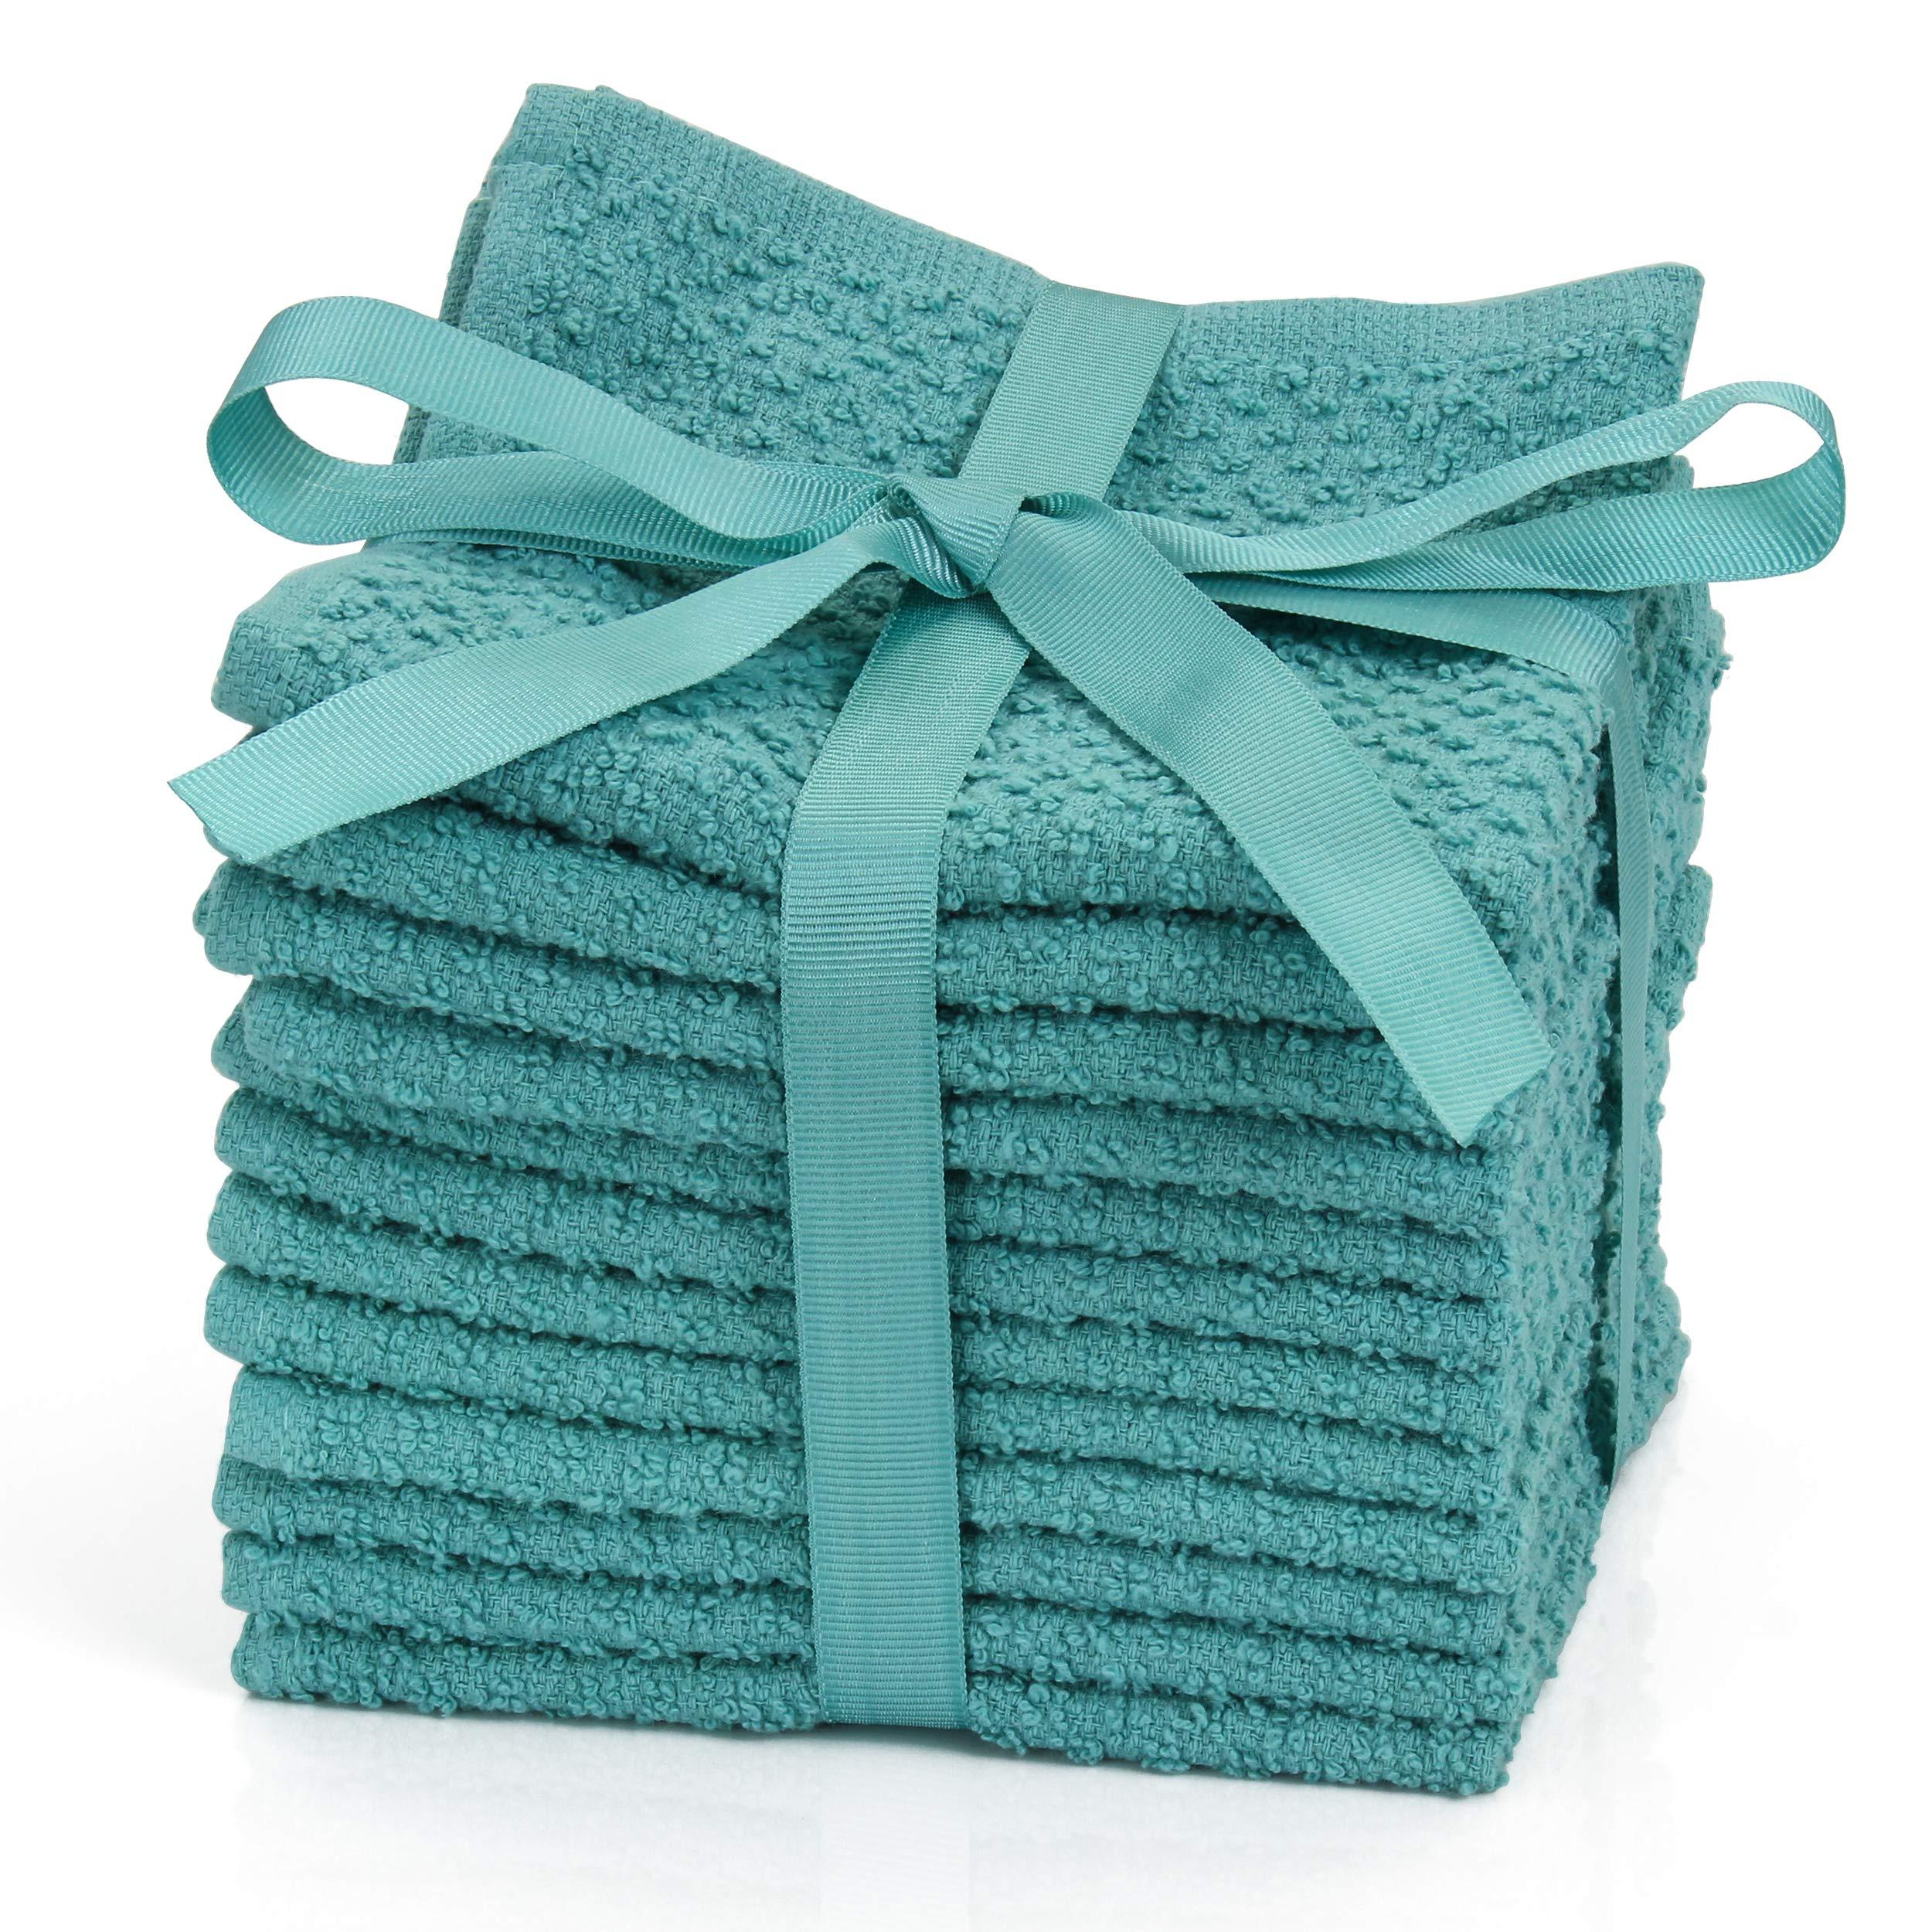 HomeCrate Solid 100% Cotton Super Soft Washcloths, 12 Piece Set, 12'' x 12'' - Turquoise